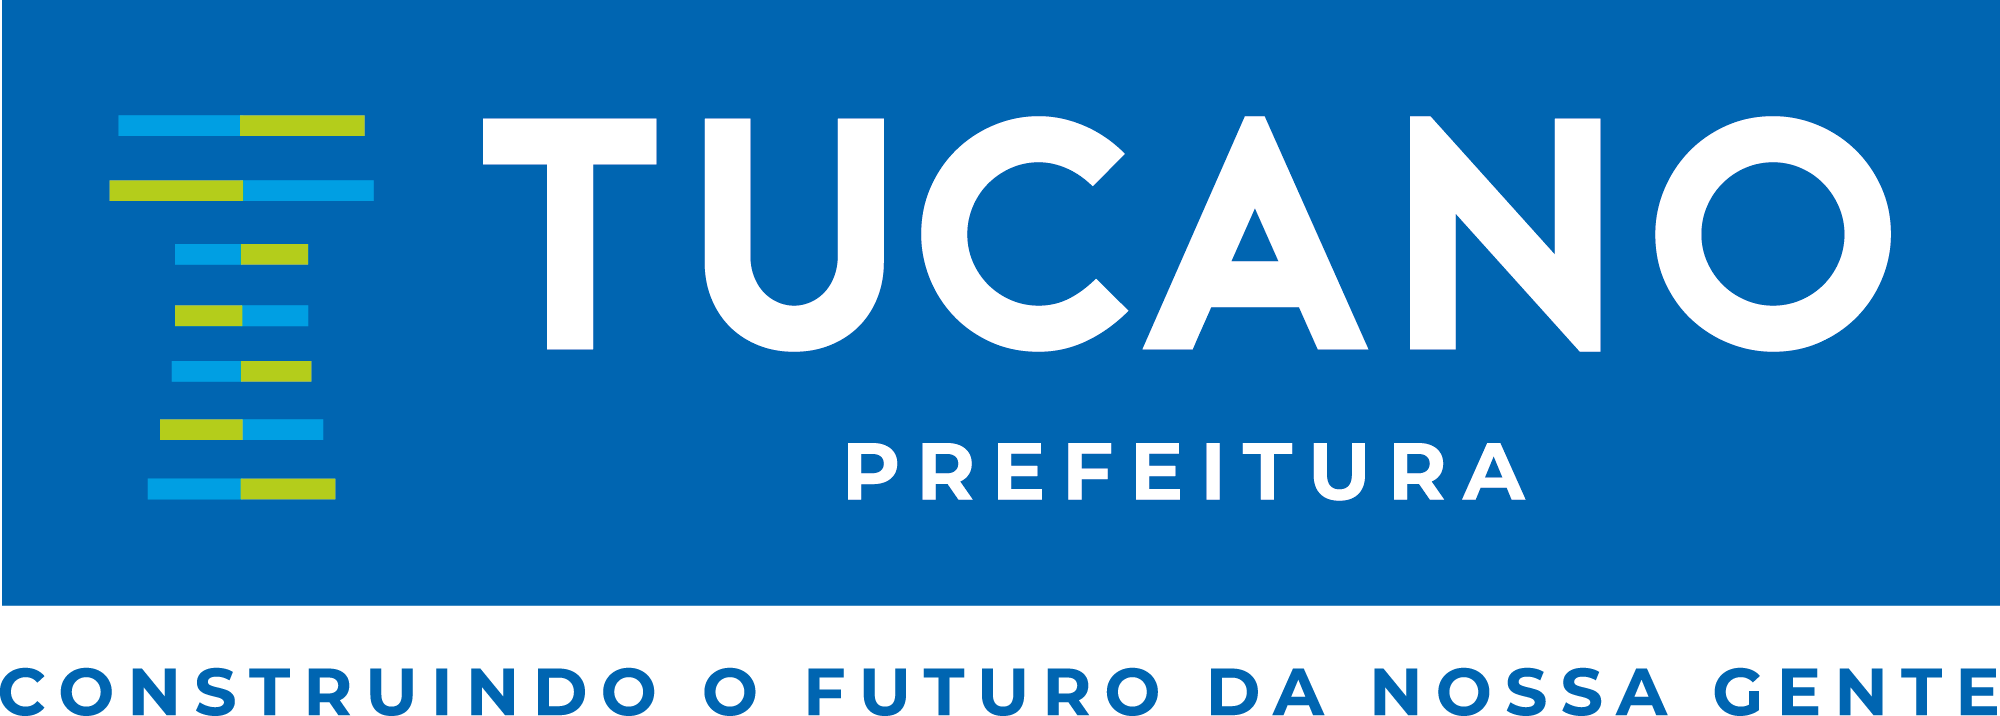 Prefeitura de Tucano